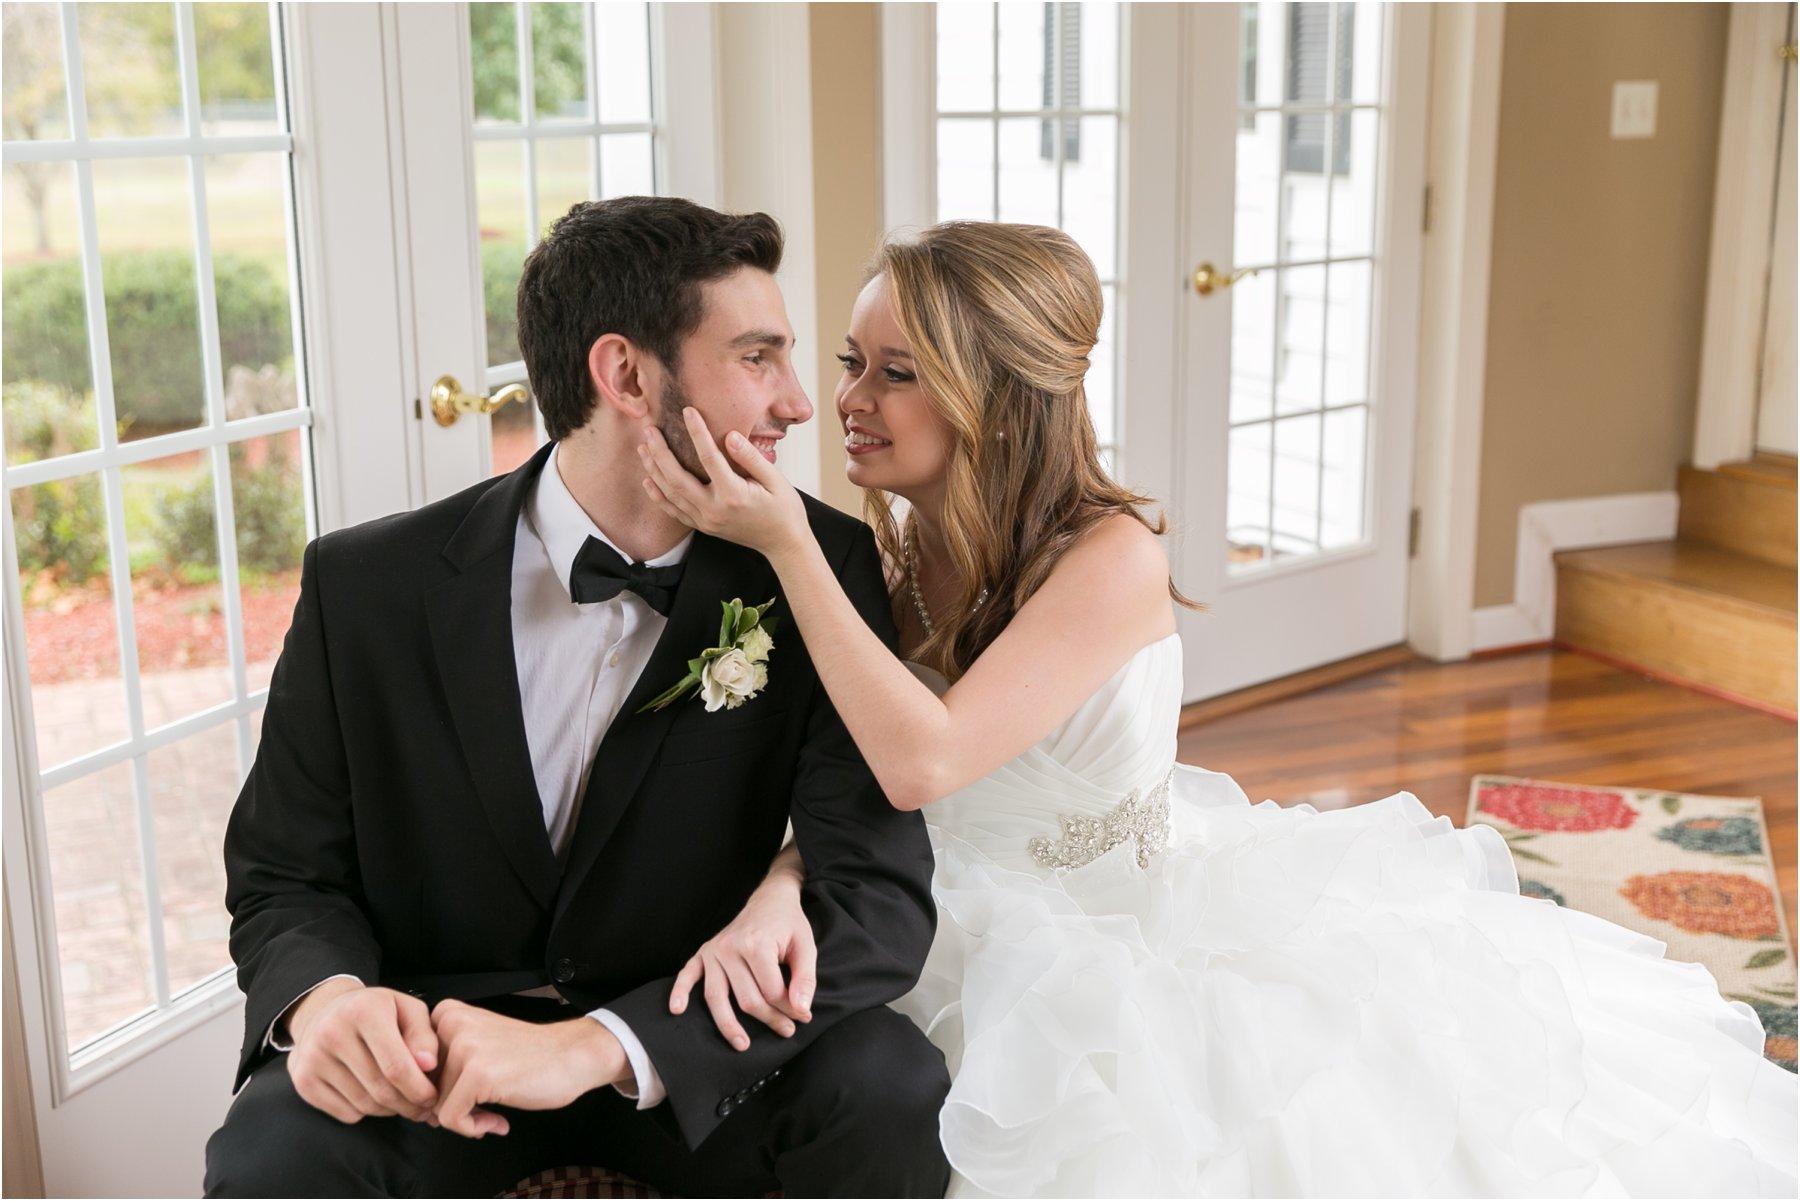 Holly_Ridge_Manor_Wedding_Photography_Jessica_Ryan_Photography_virginia_virginia_beach_0252